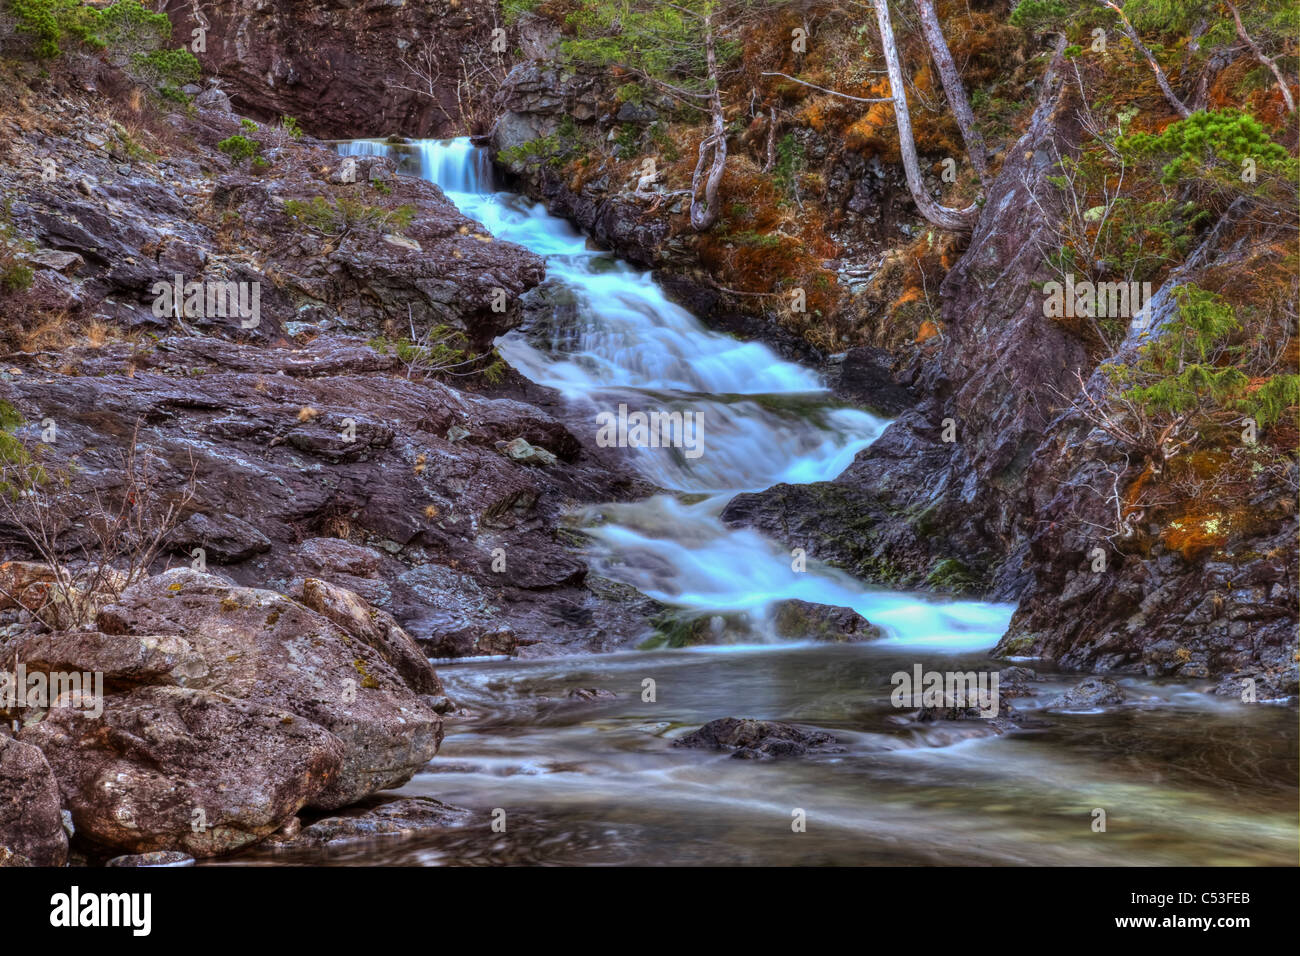 Scenic of a waterfall on Annette Island near Metlakatla, Inside Passage, Southeast Alaska, Spring. HDR - Stock Image